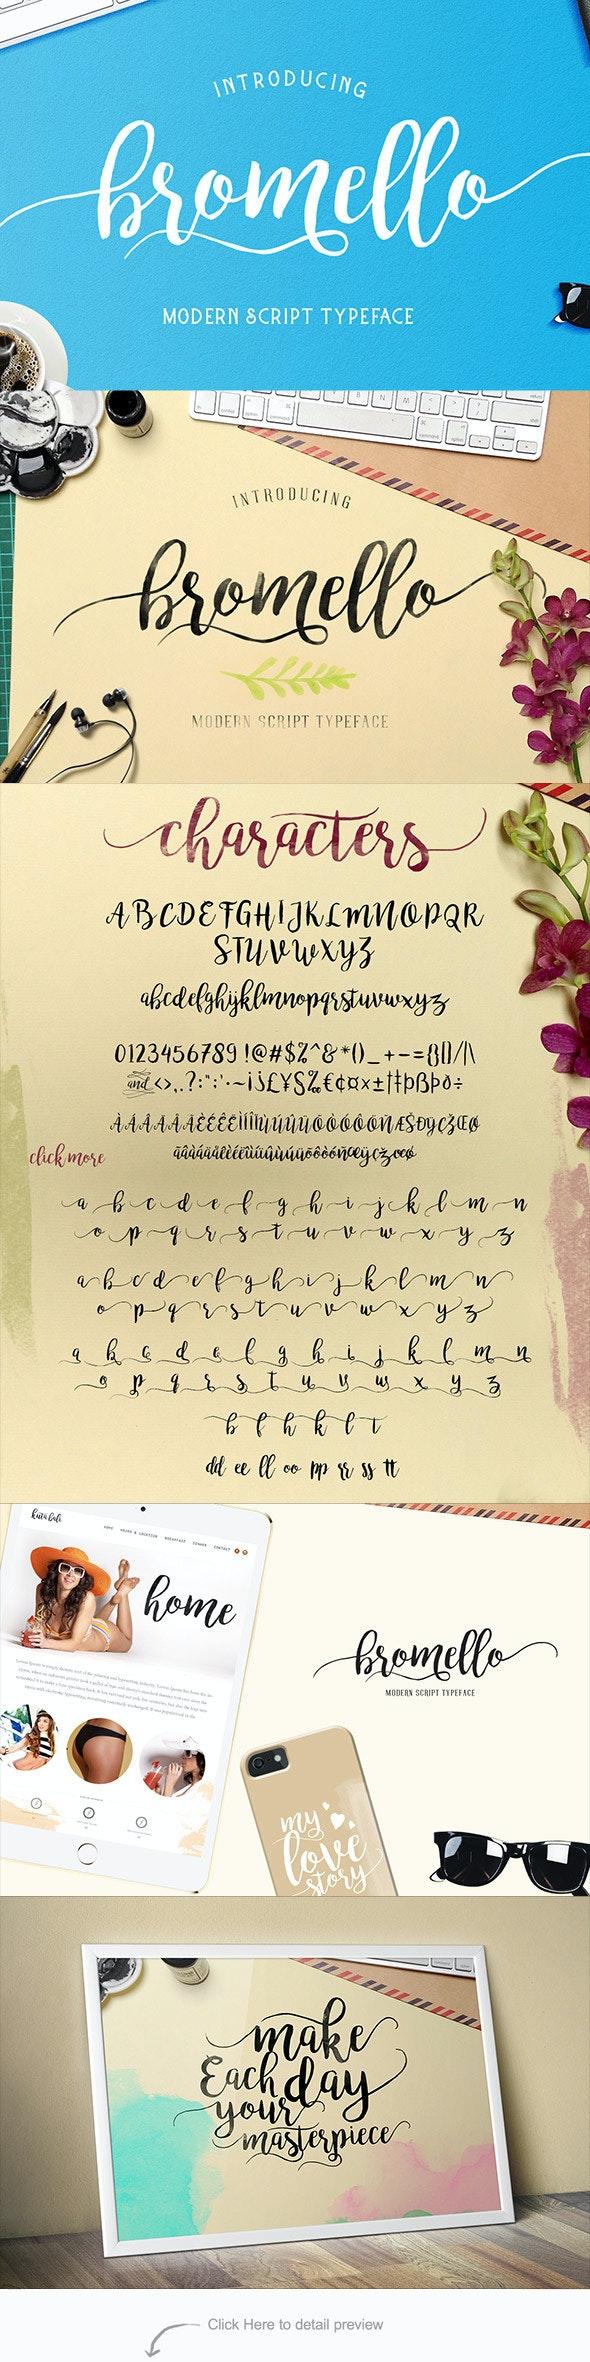 bromello typeface - Hand-writing Script